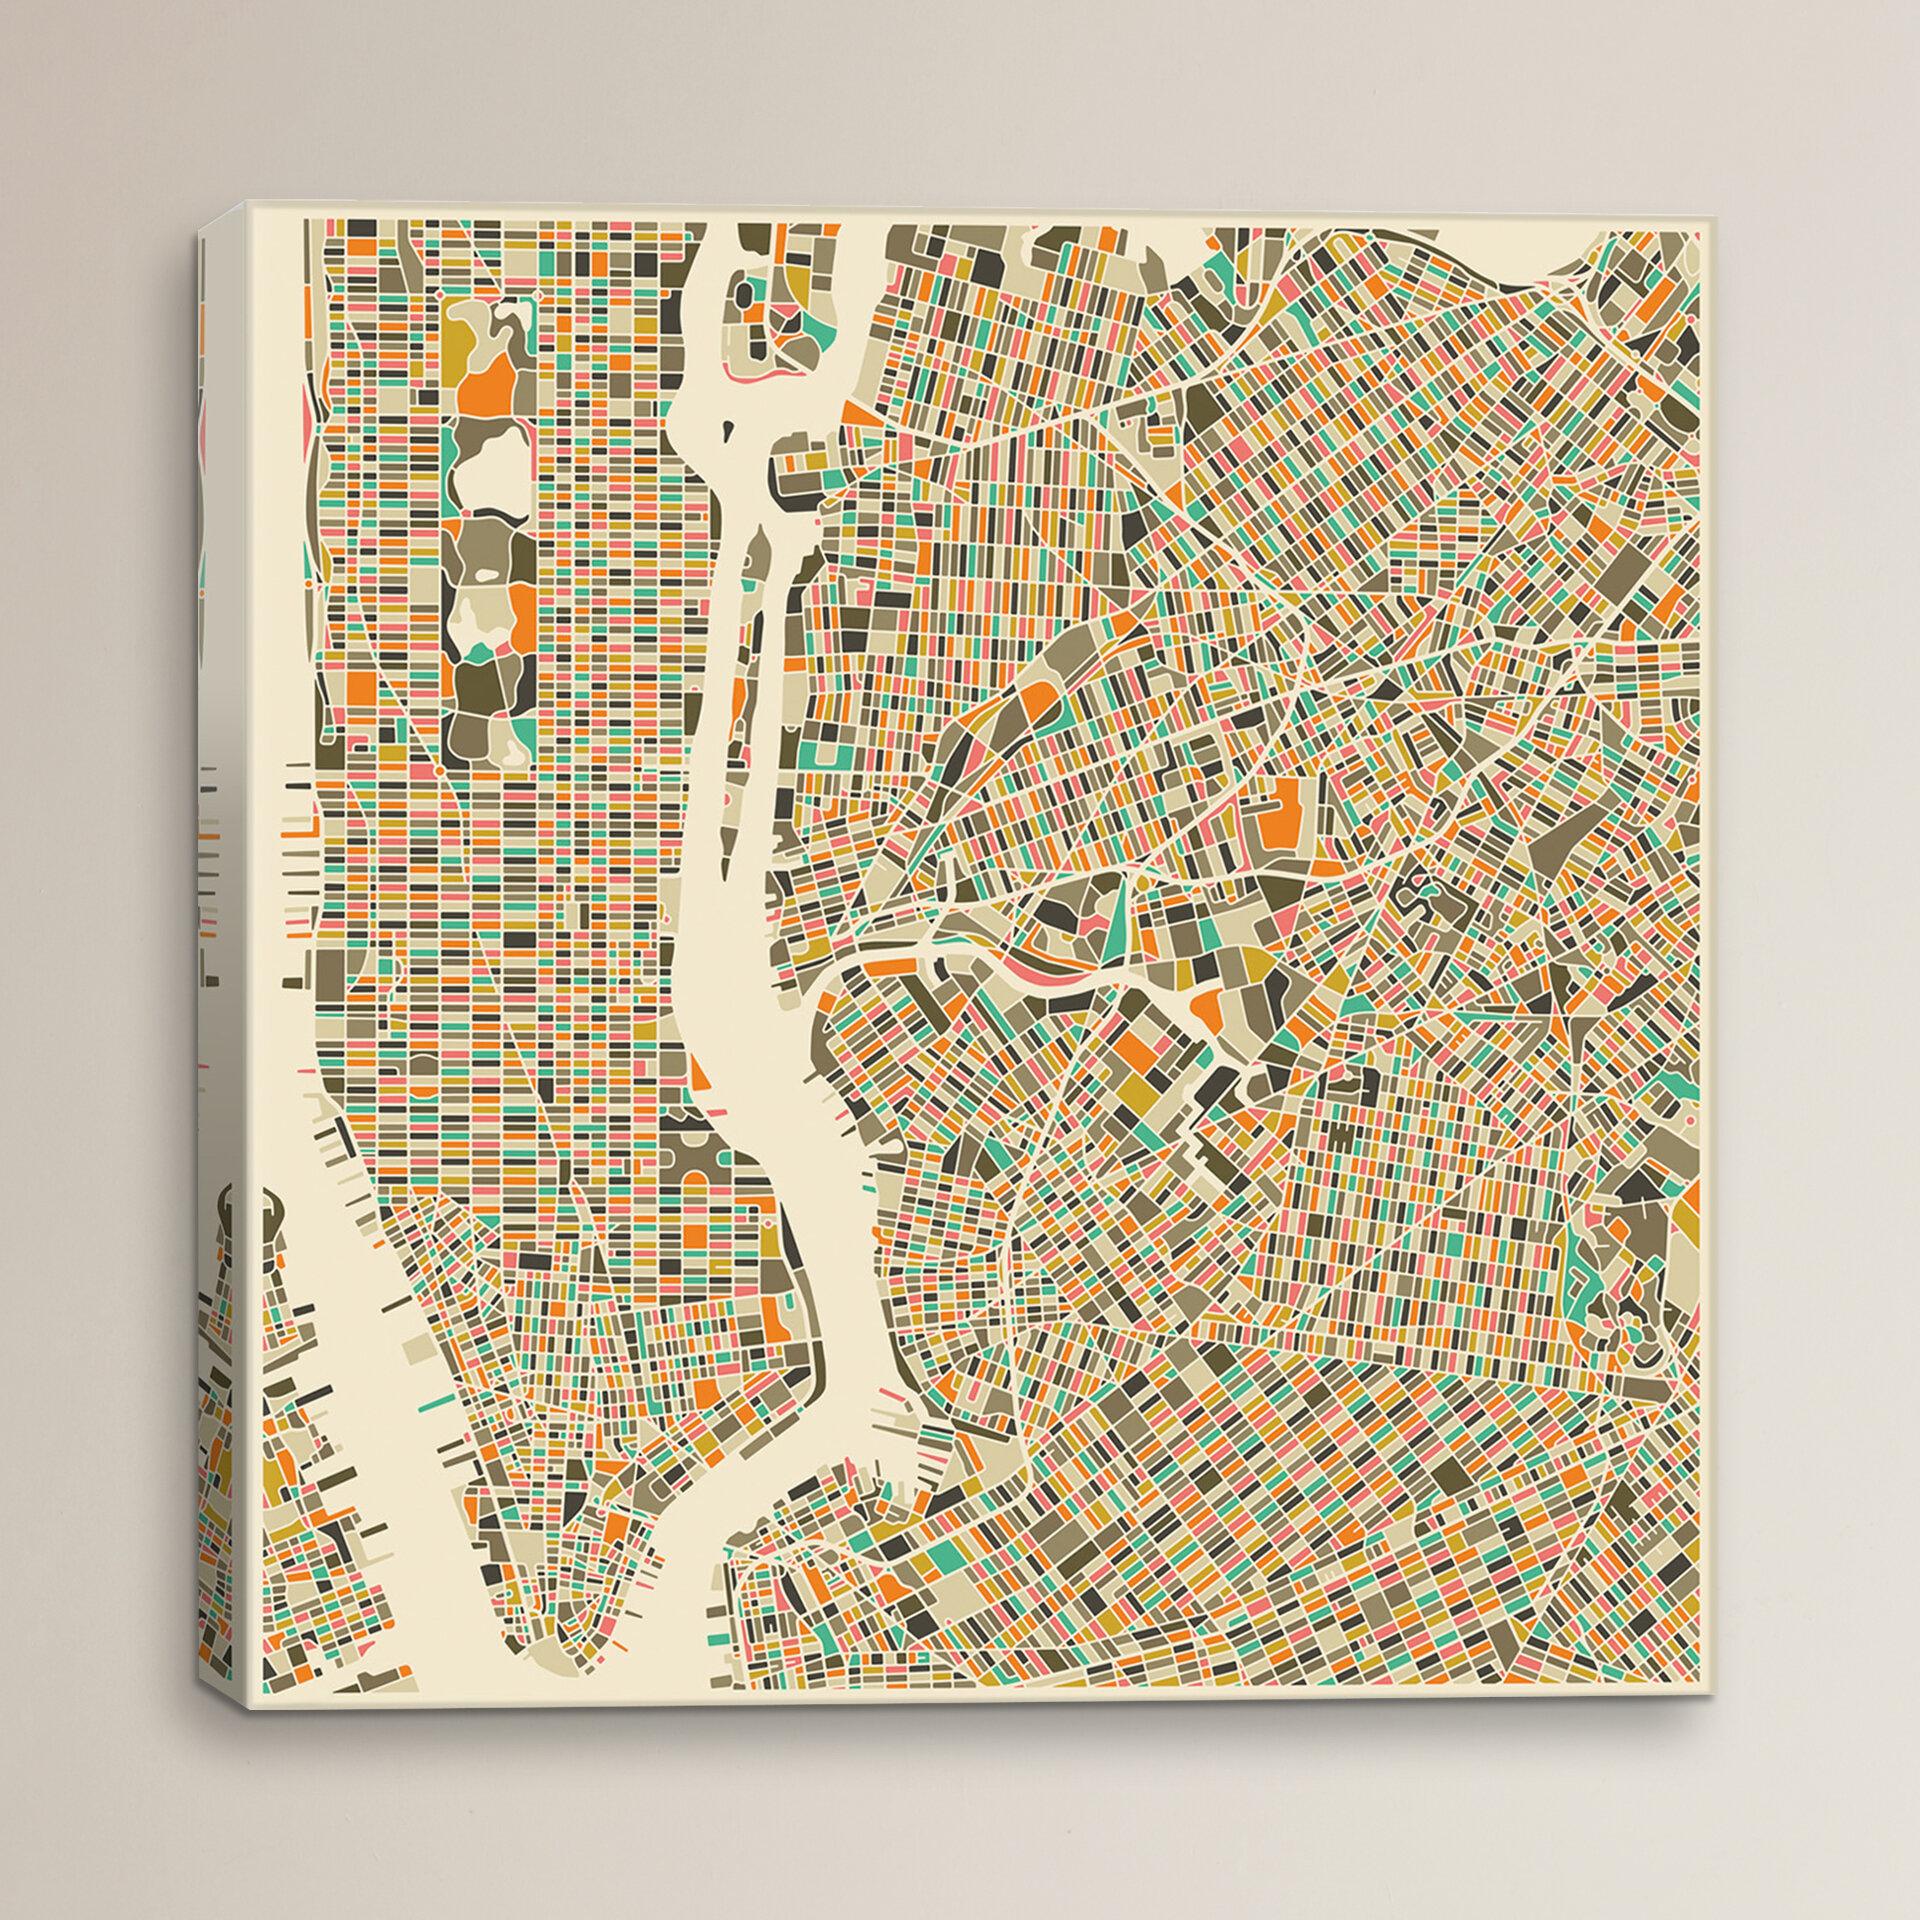 City Map Of New York City.Wrought Studio Abstract City Map Of New York City By Jazzberry Blue